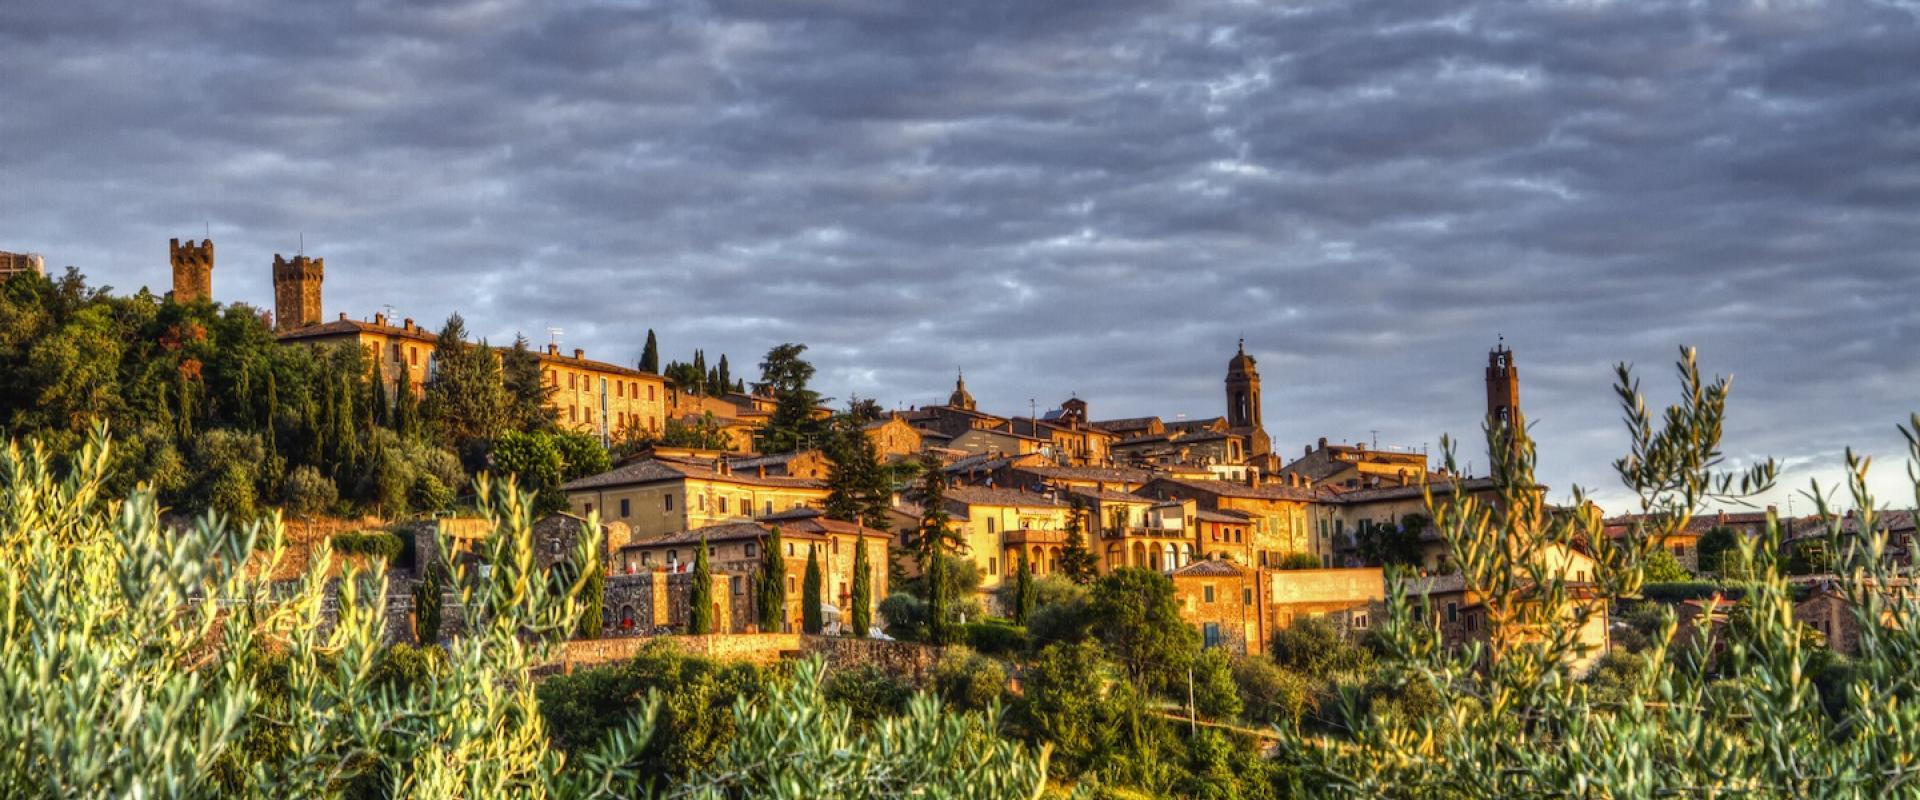 Visit of Montalcino Tuscany, Brunello's wine town!